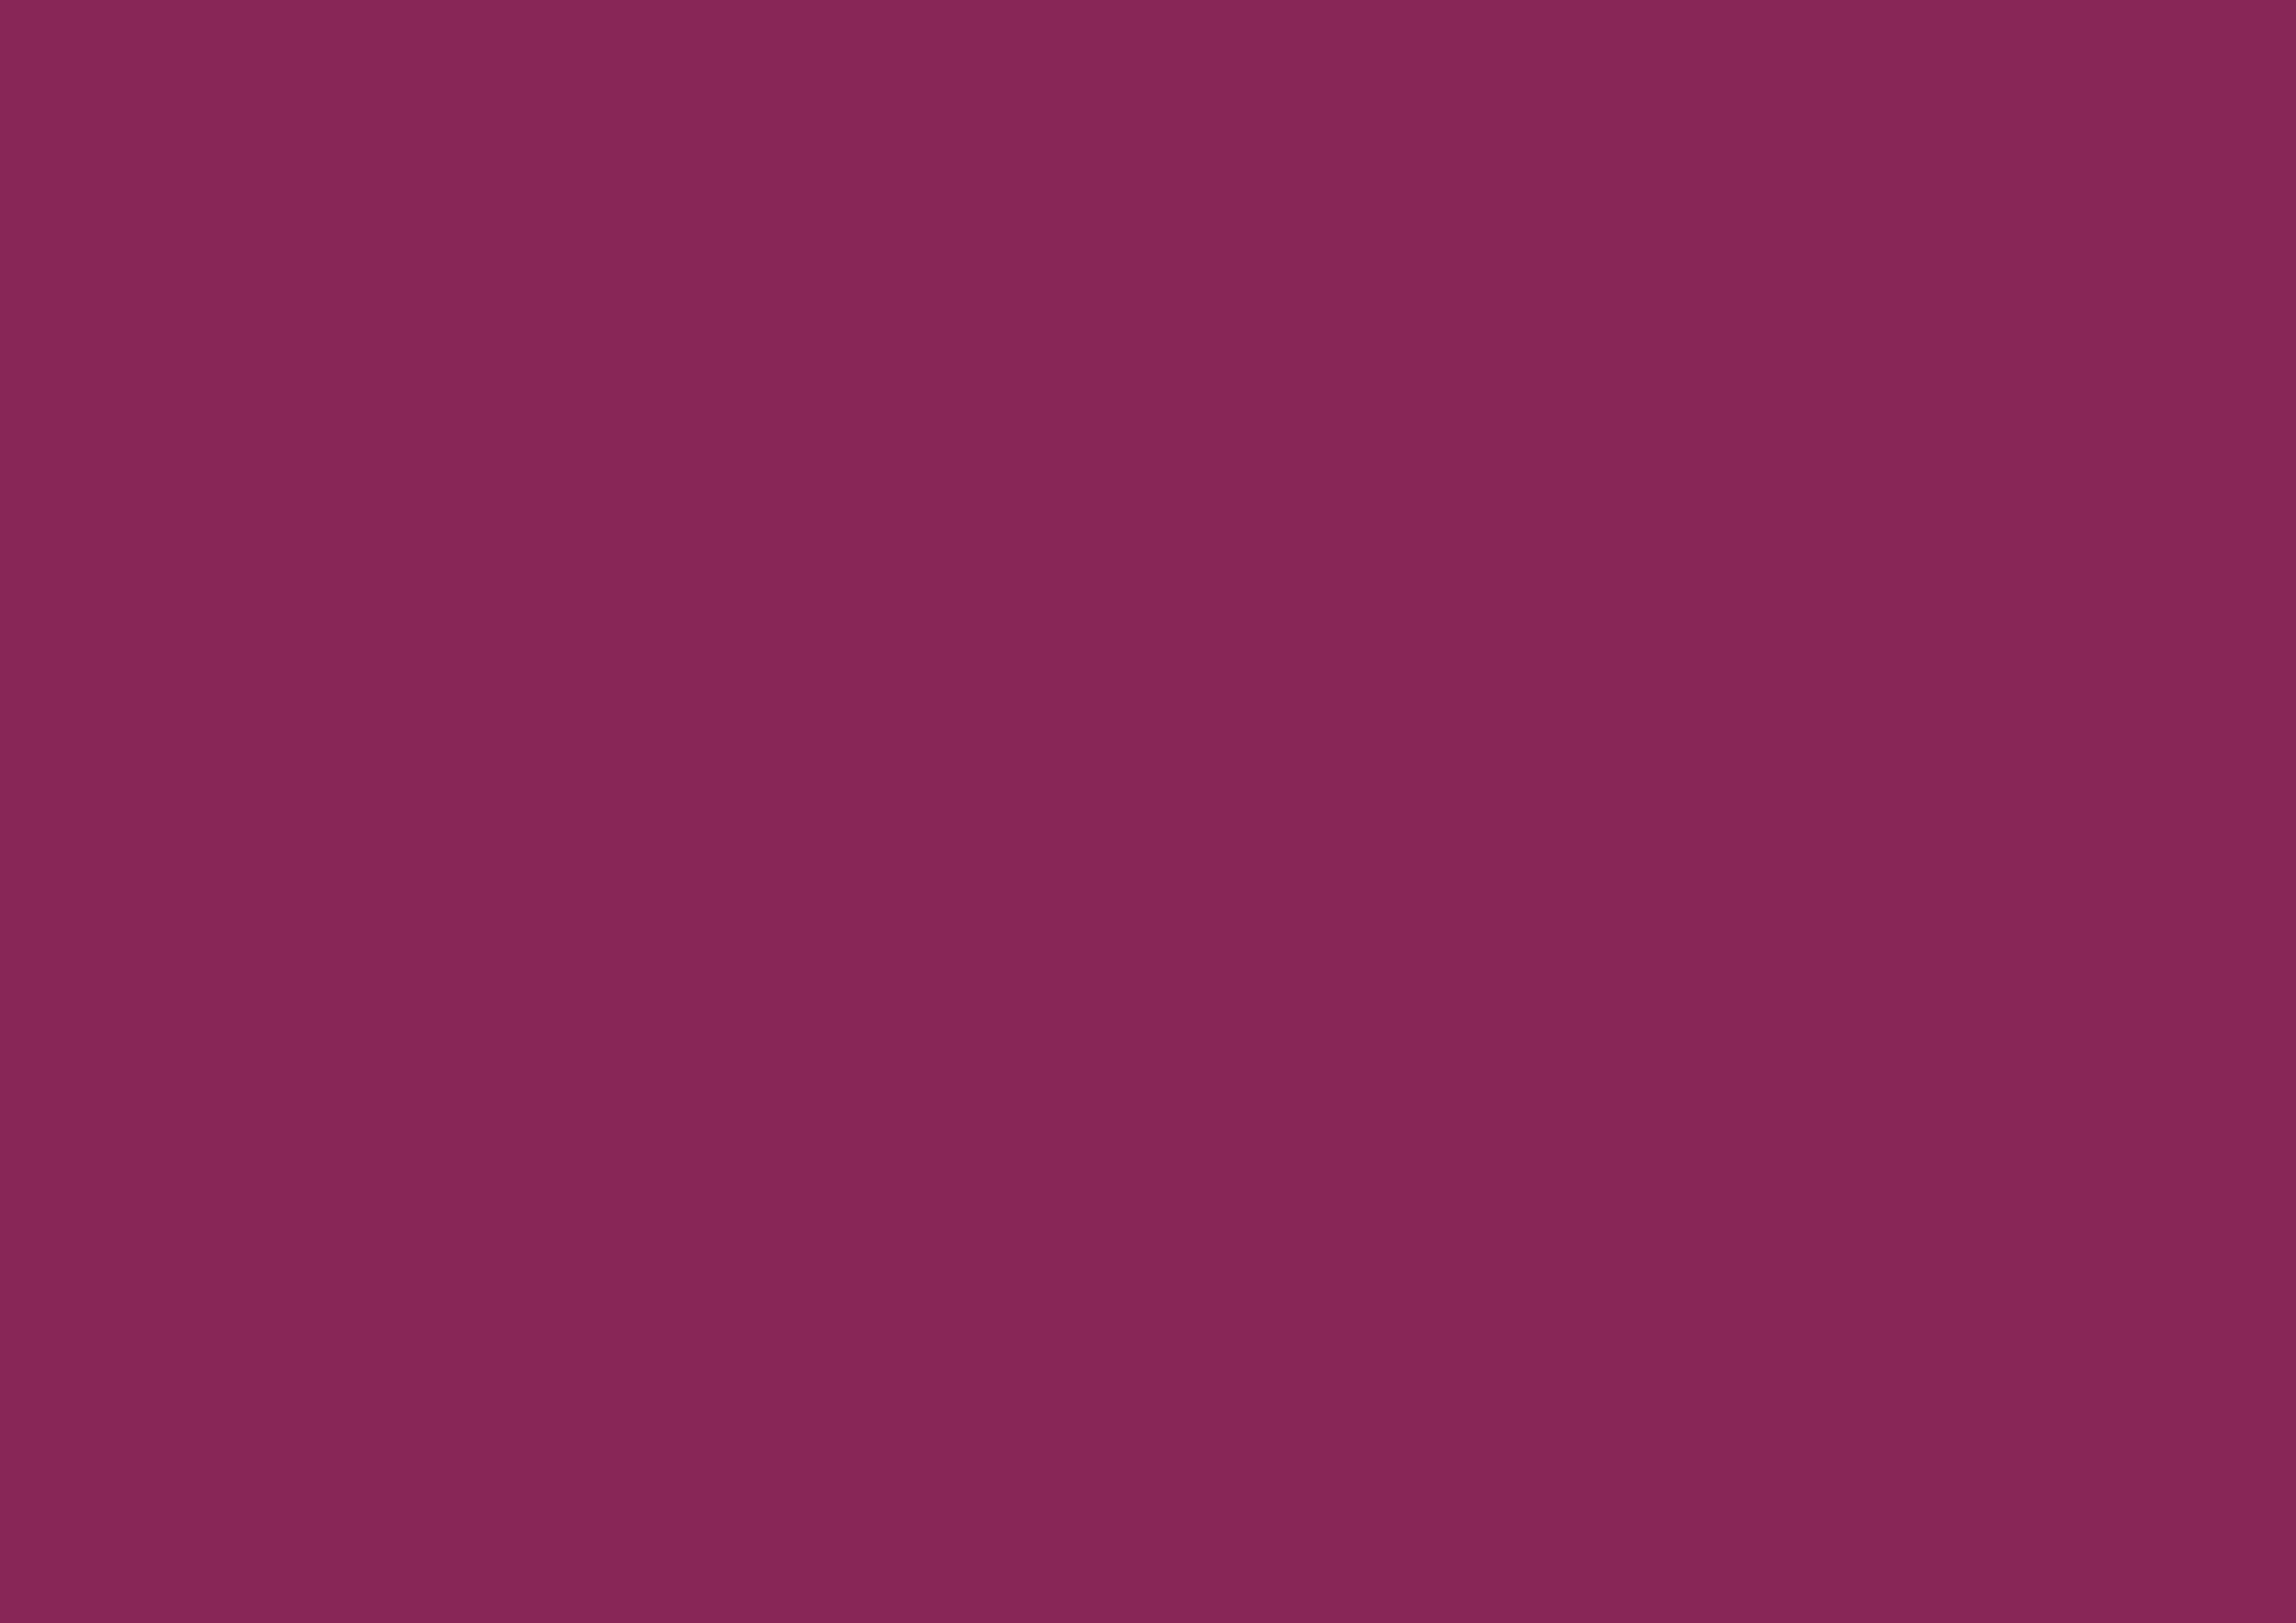 3508x2480 Dark Raspberry Solid Color Background